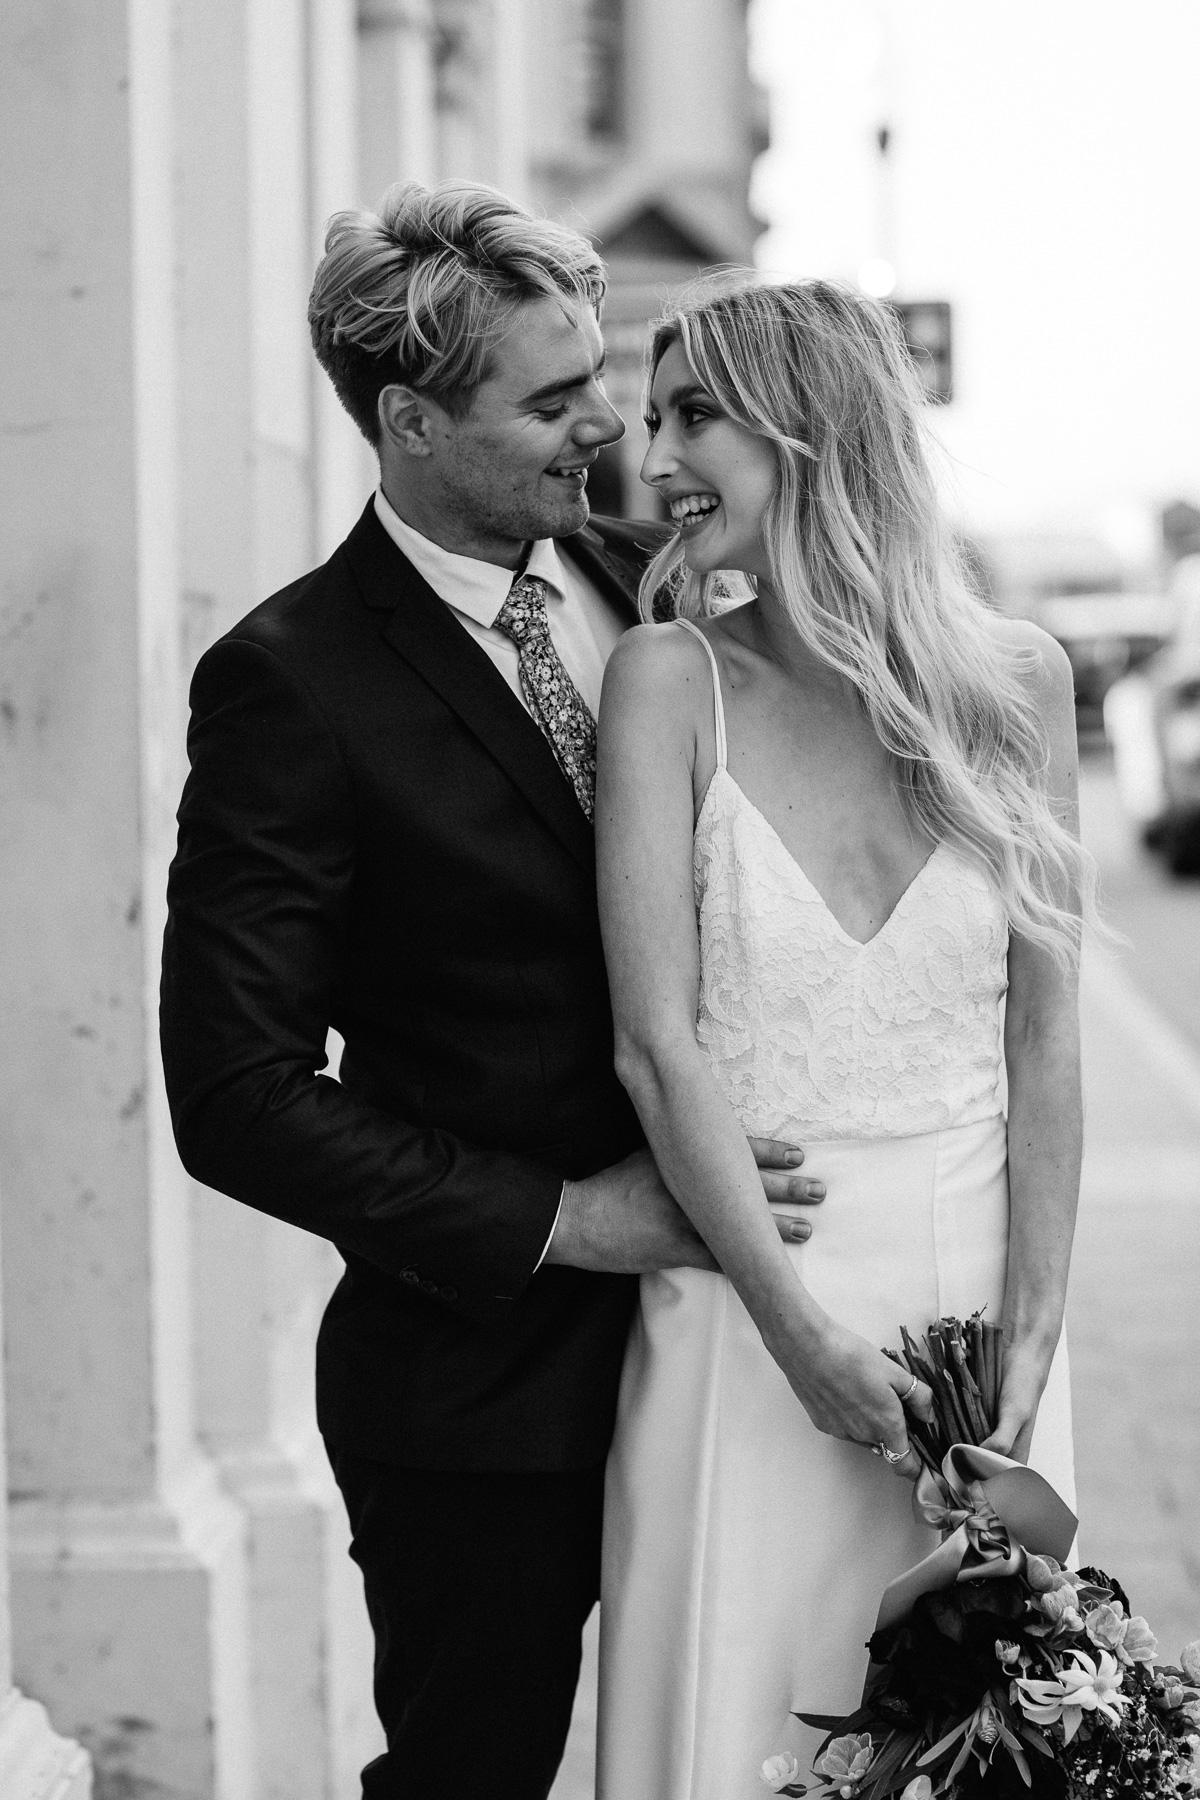 The Bloom Romantic-Peggy Saas Perth Wedding Photographer-Same Sex Wedding-55.jpg